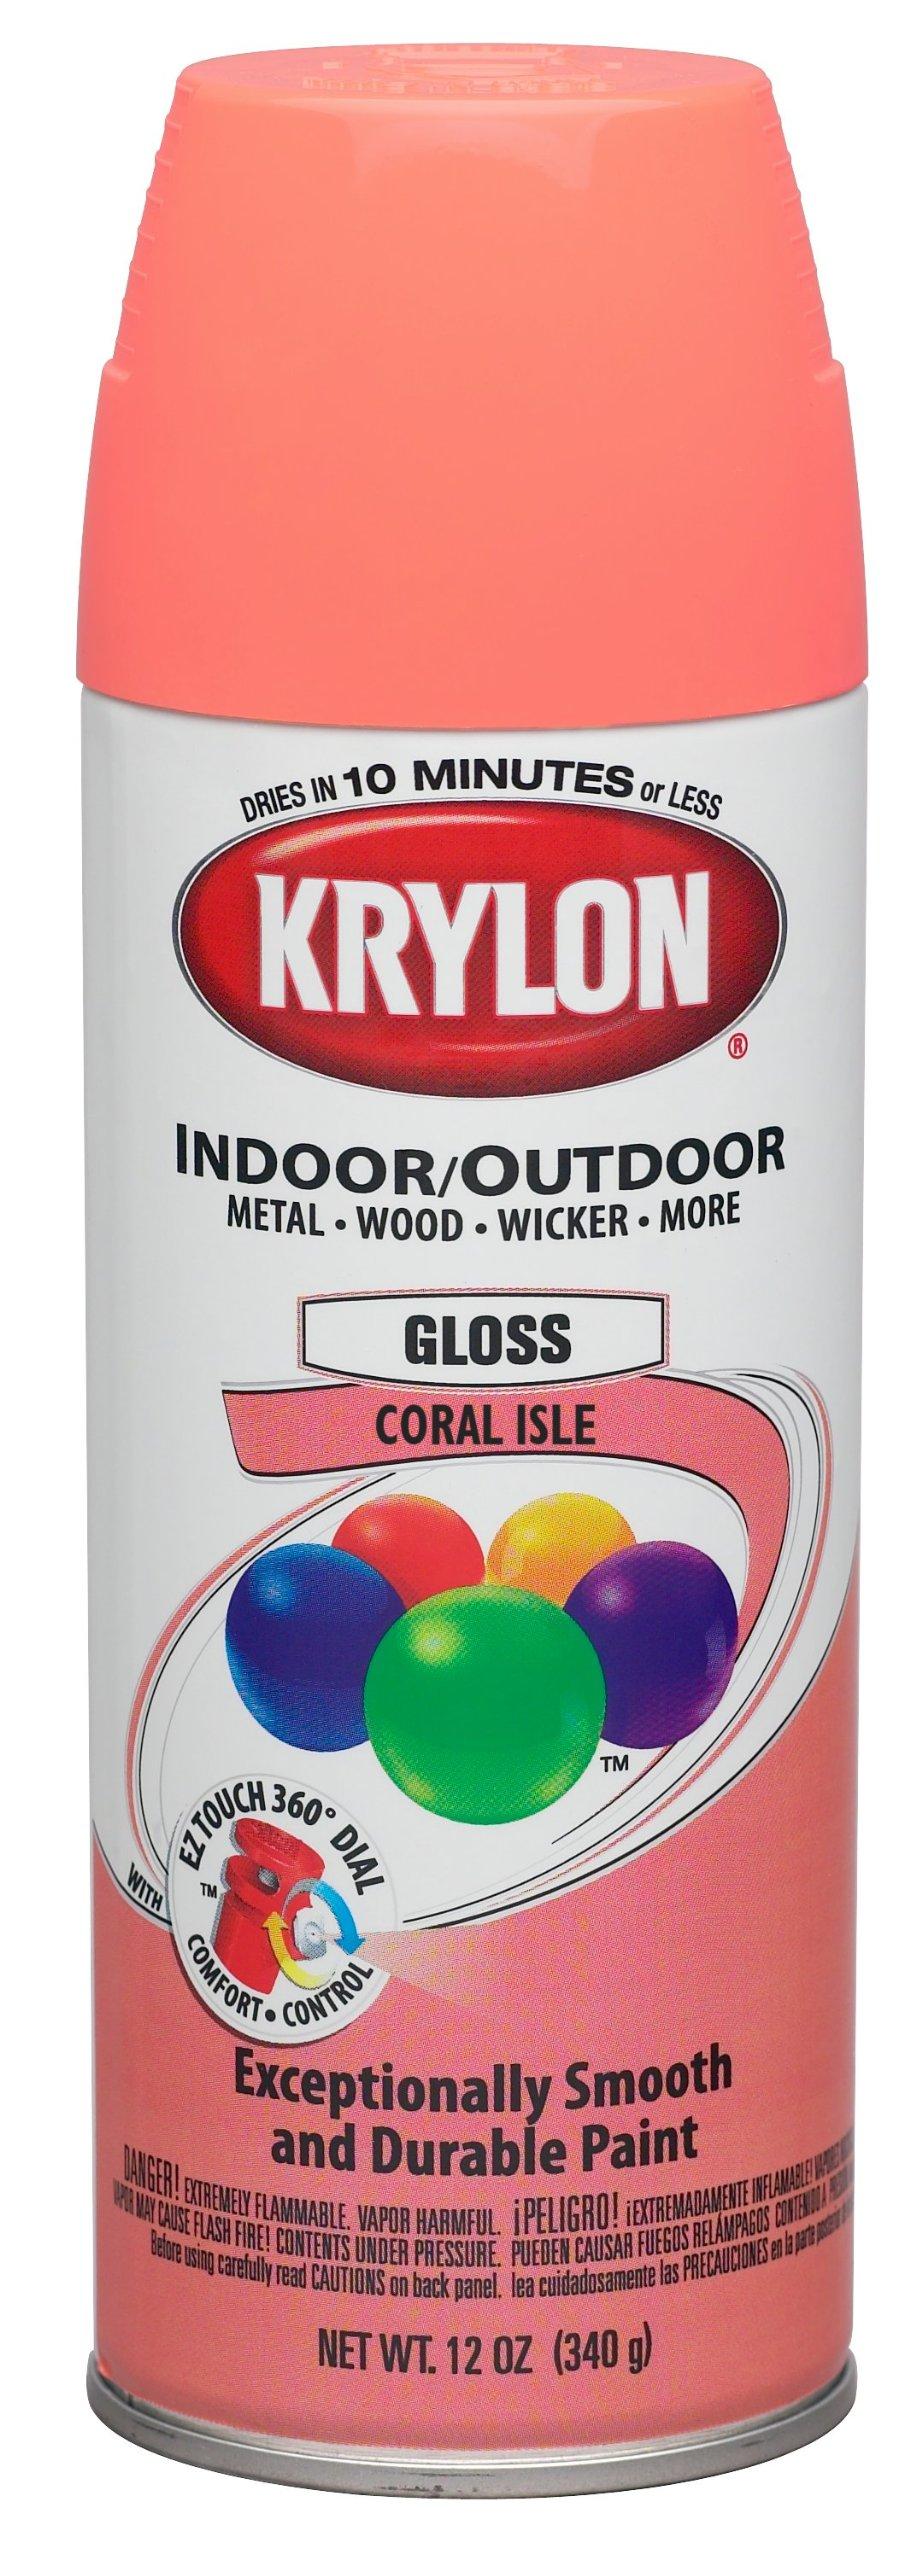 Krylon (K05210307-6 PK) Coral Isle Interior/Exterior Decorator Paint - 12 oz. Aerosol, (Case of 6)